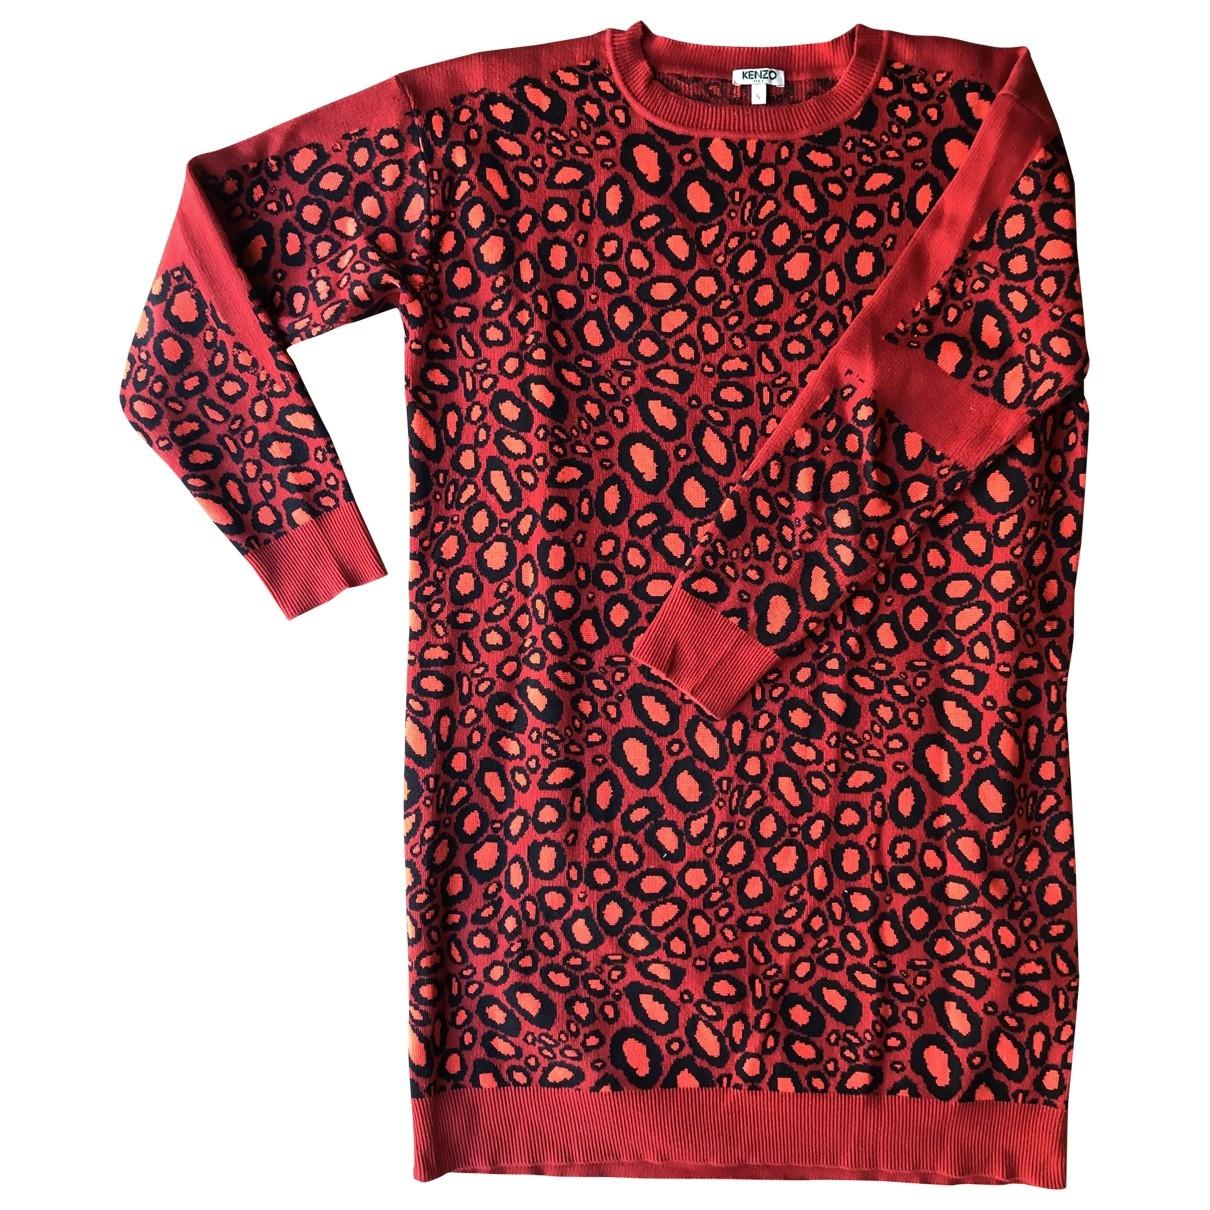 Kenzo \N Red Cotton dress for Women S International